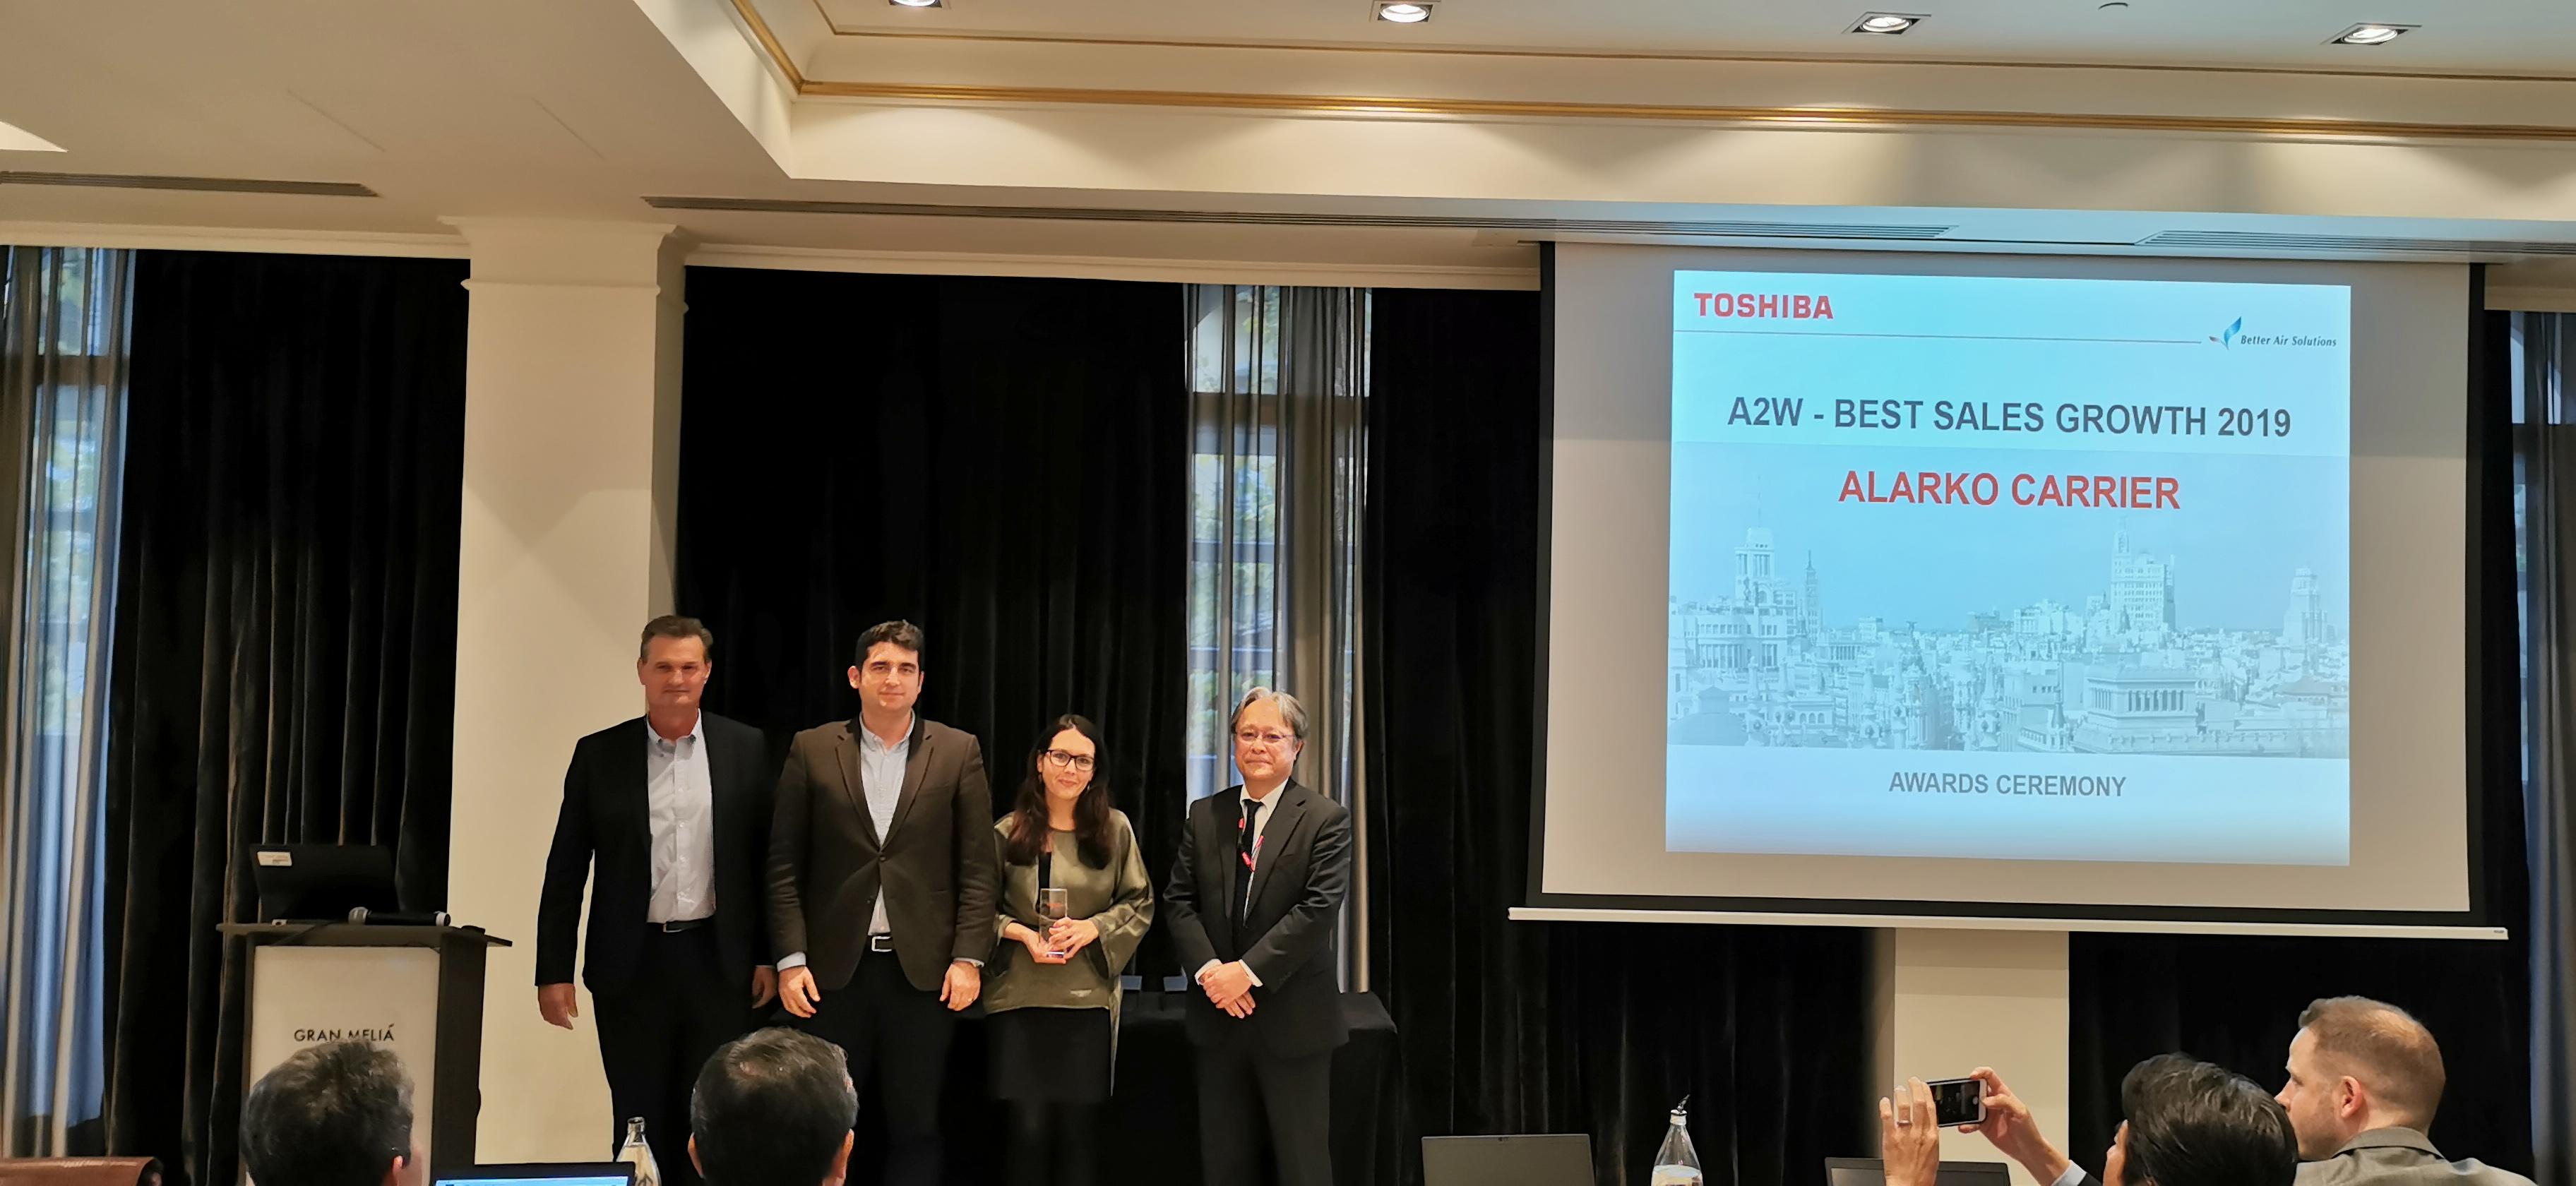 "Alarko Carrier Wins ""EMEA Region - The Best Sales Growth"" Award with its Heat Pump Product Range"